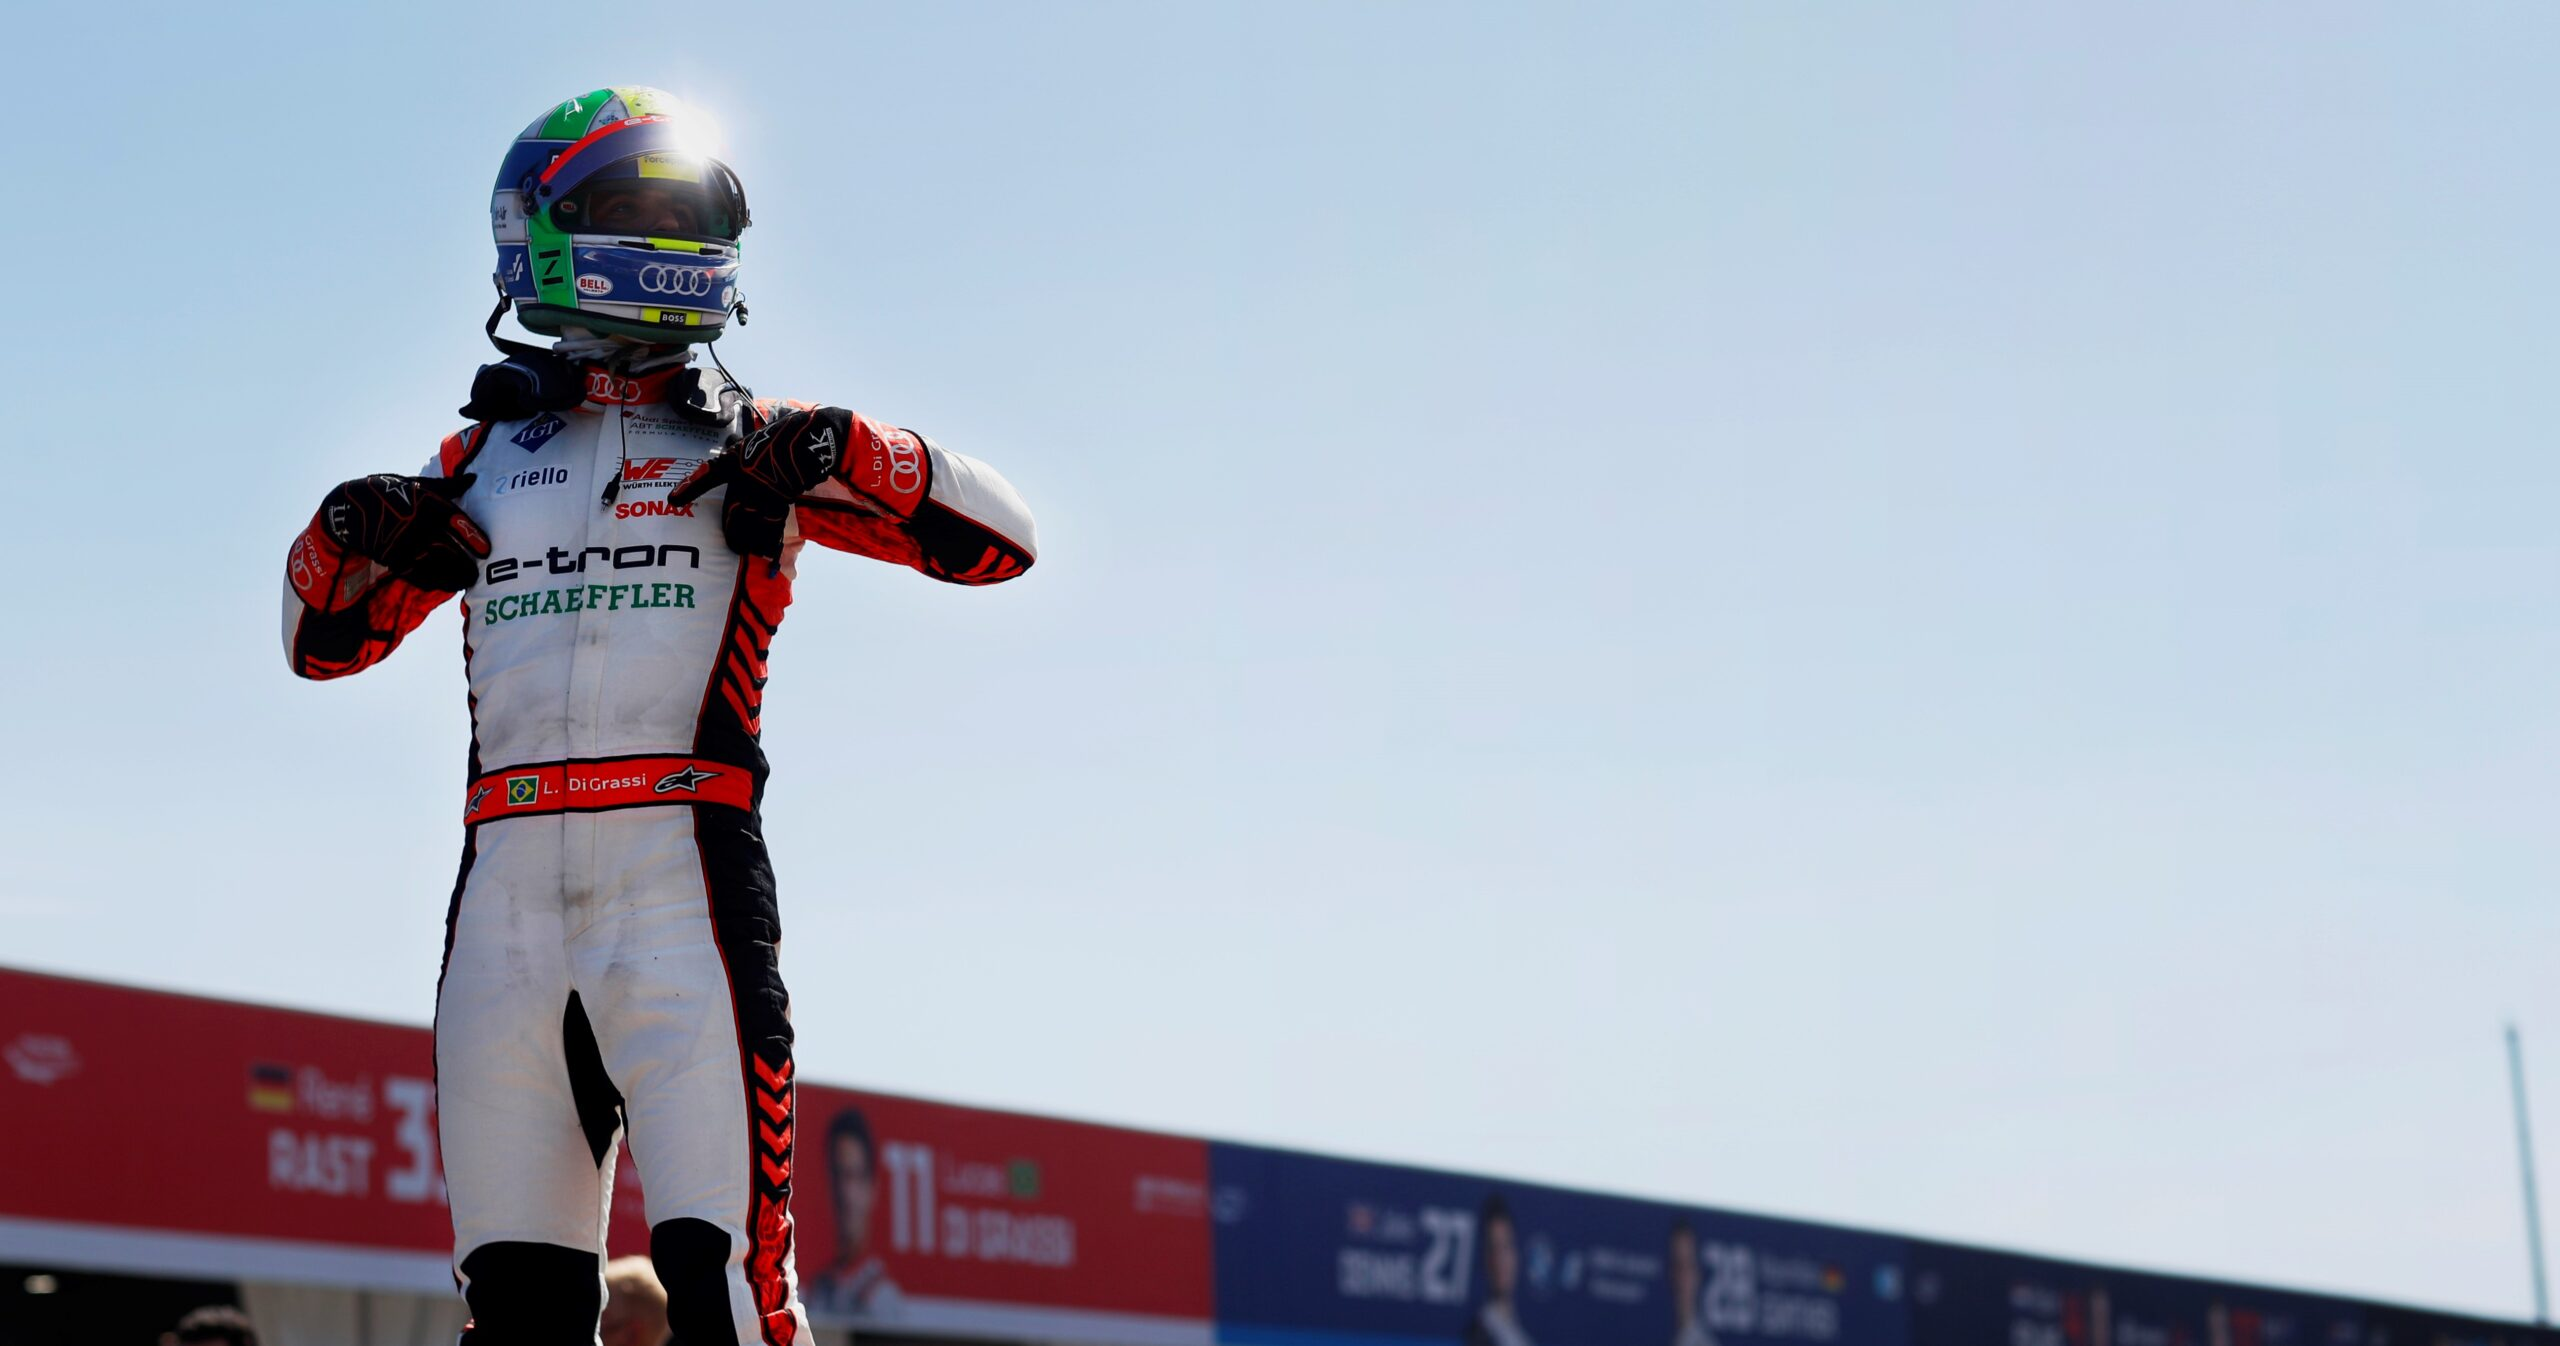 Gara E-Prix di Berlino (Round 14): Di Grassi vince con l'Audi, davanti a Mortara.